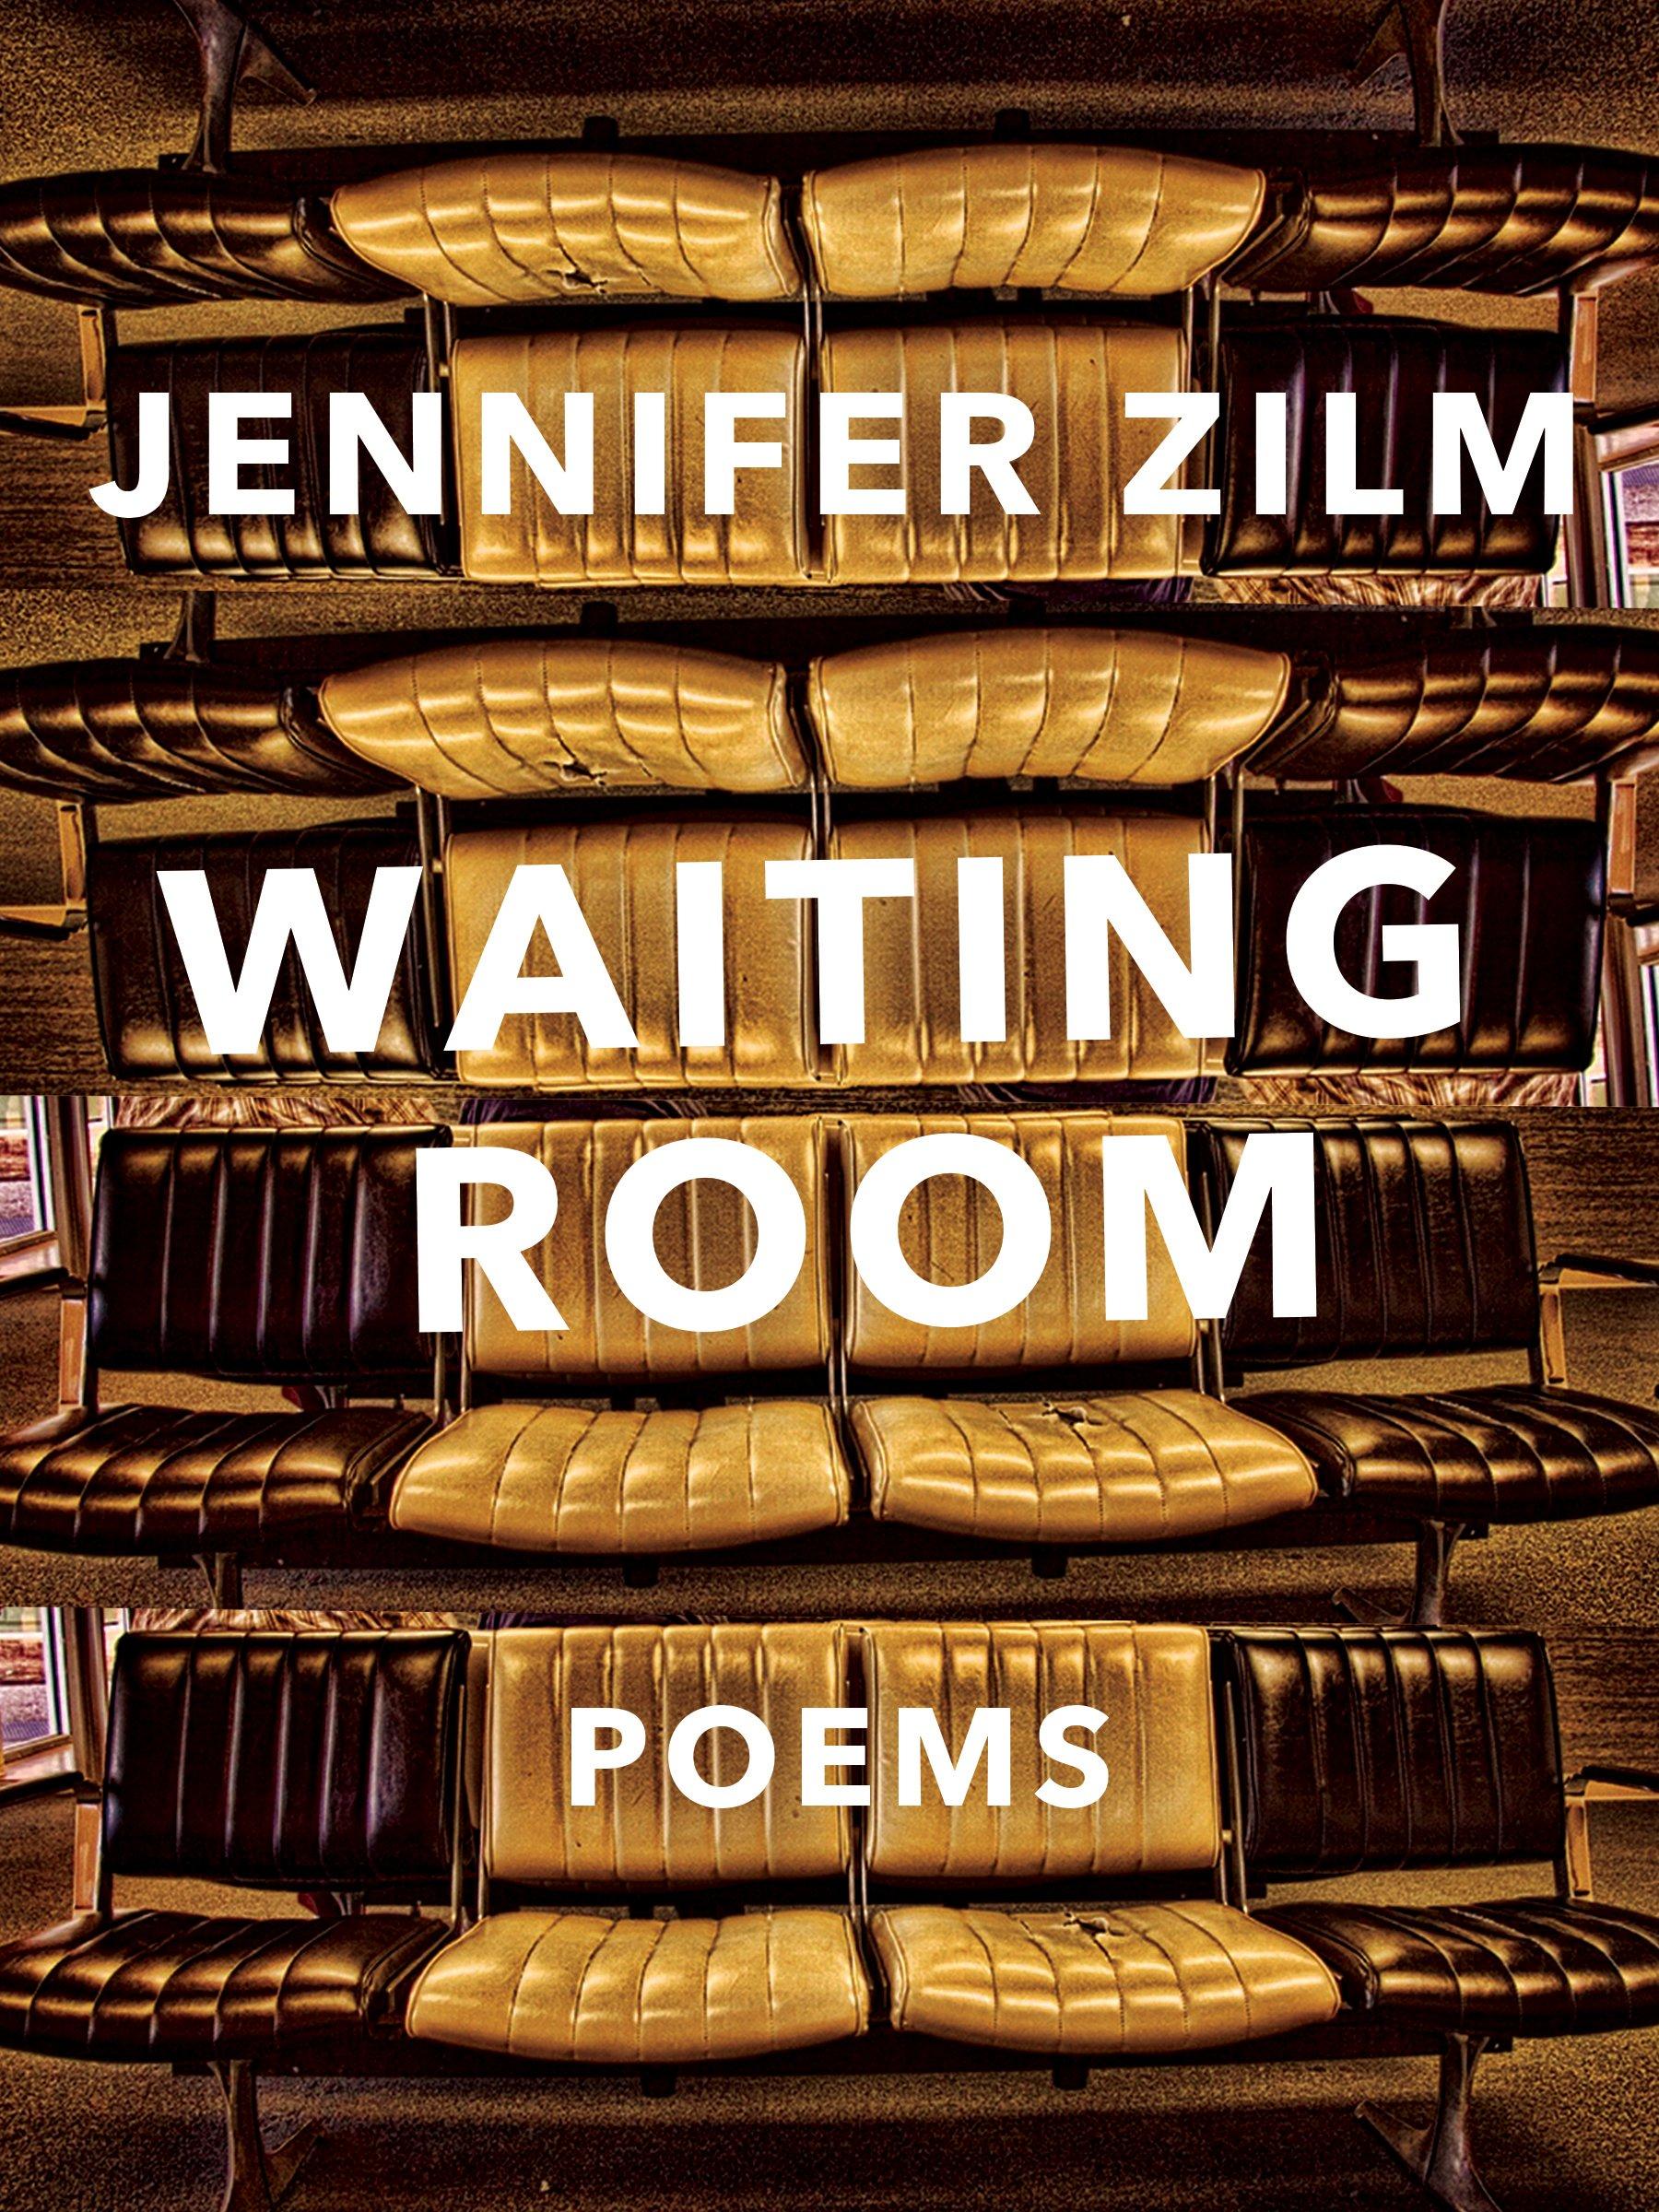 Waiting Room Paperback – April 5, 2016